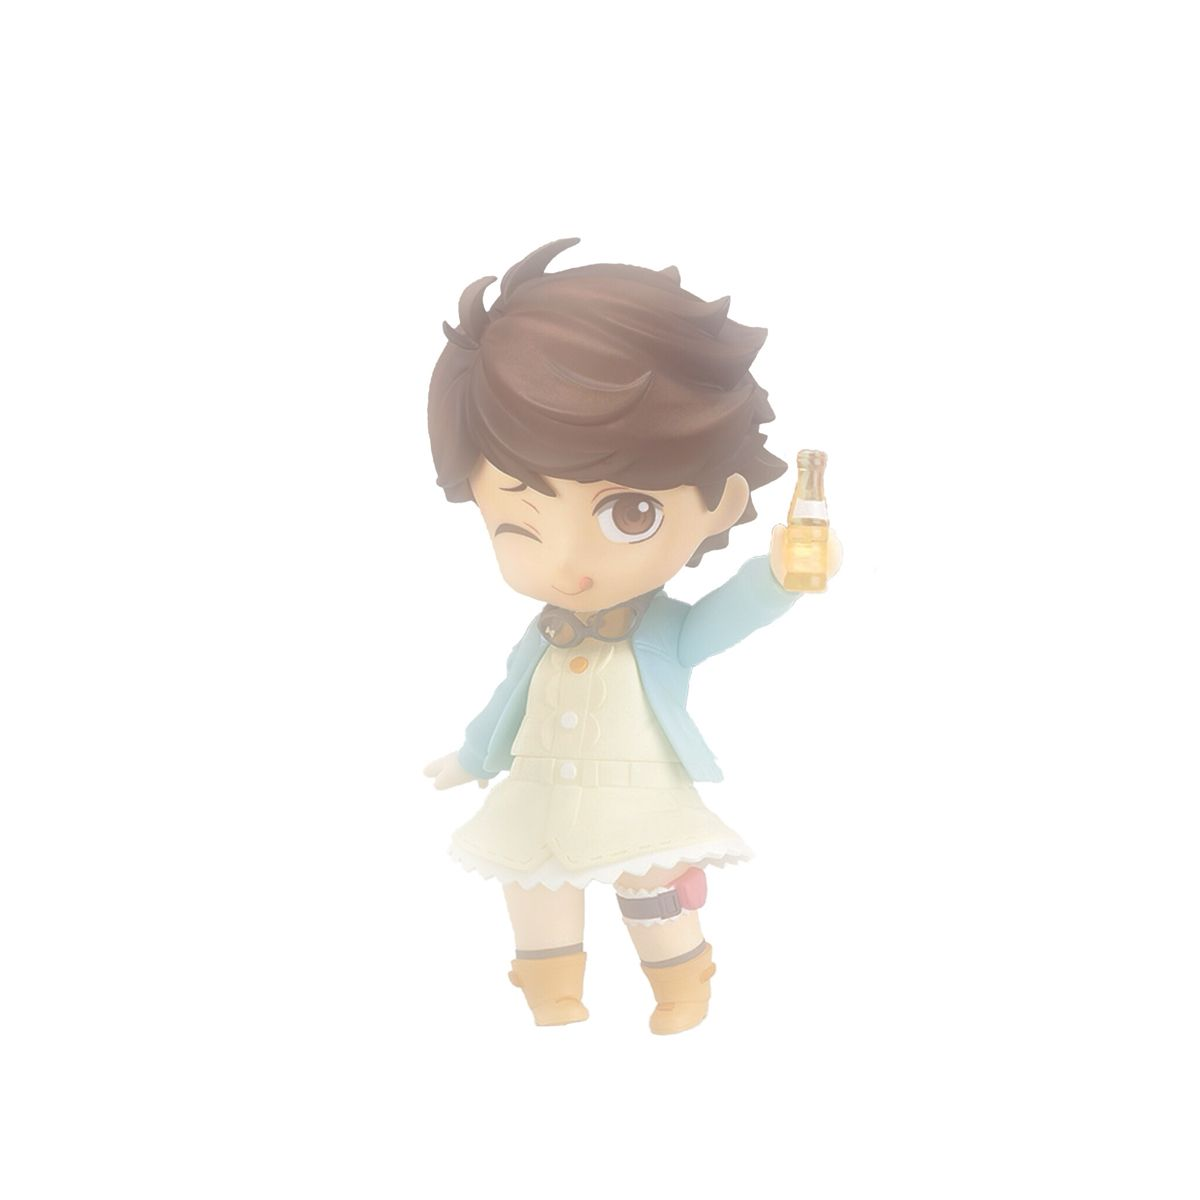 Pin By Ren On Nendoroid Anime In 2021 Nendoroid Anime Haikyuu Anime Nendoroid